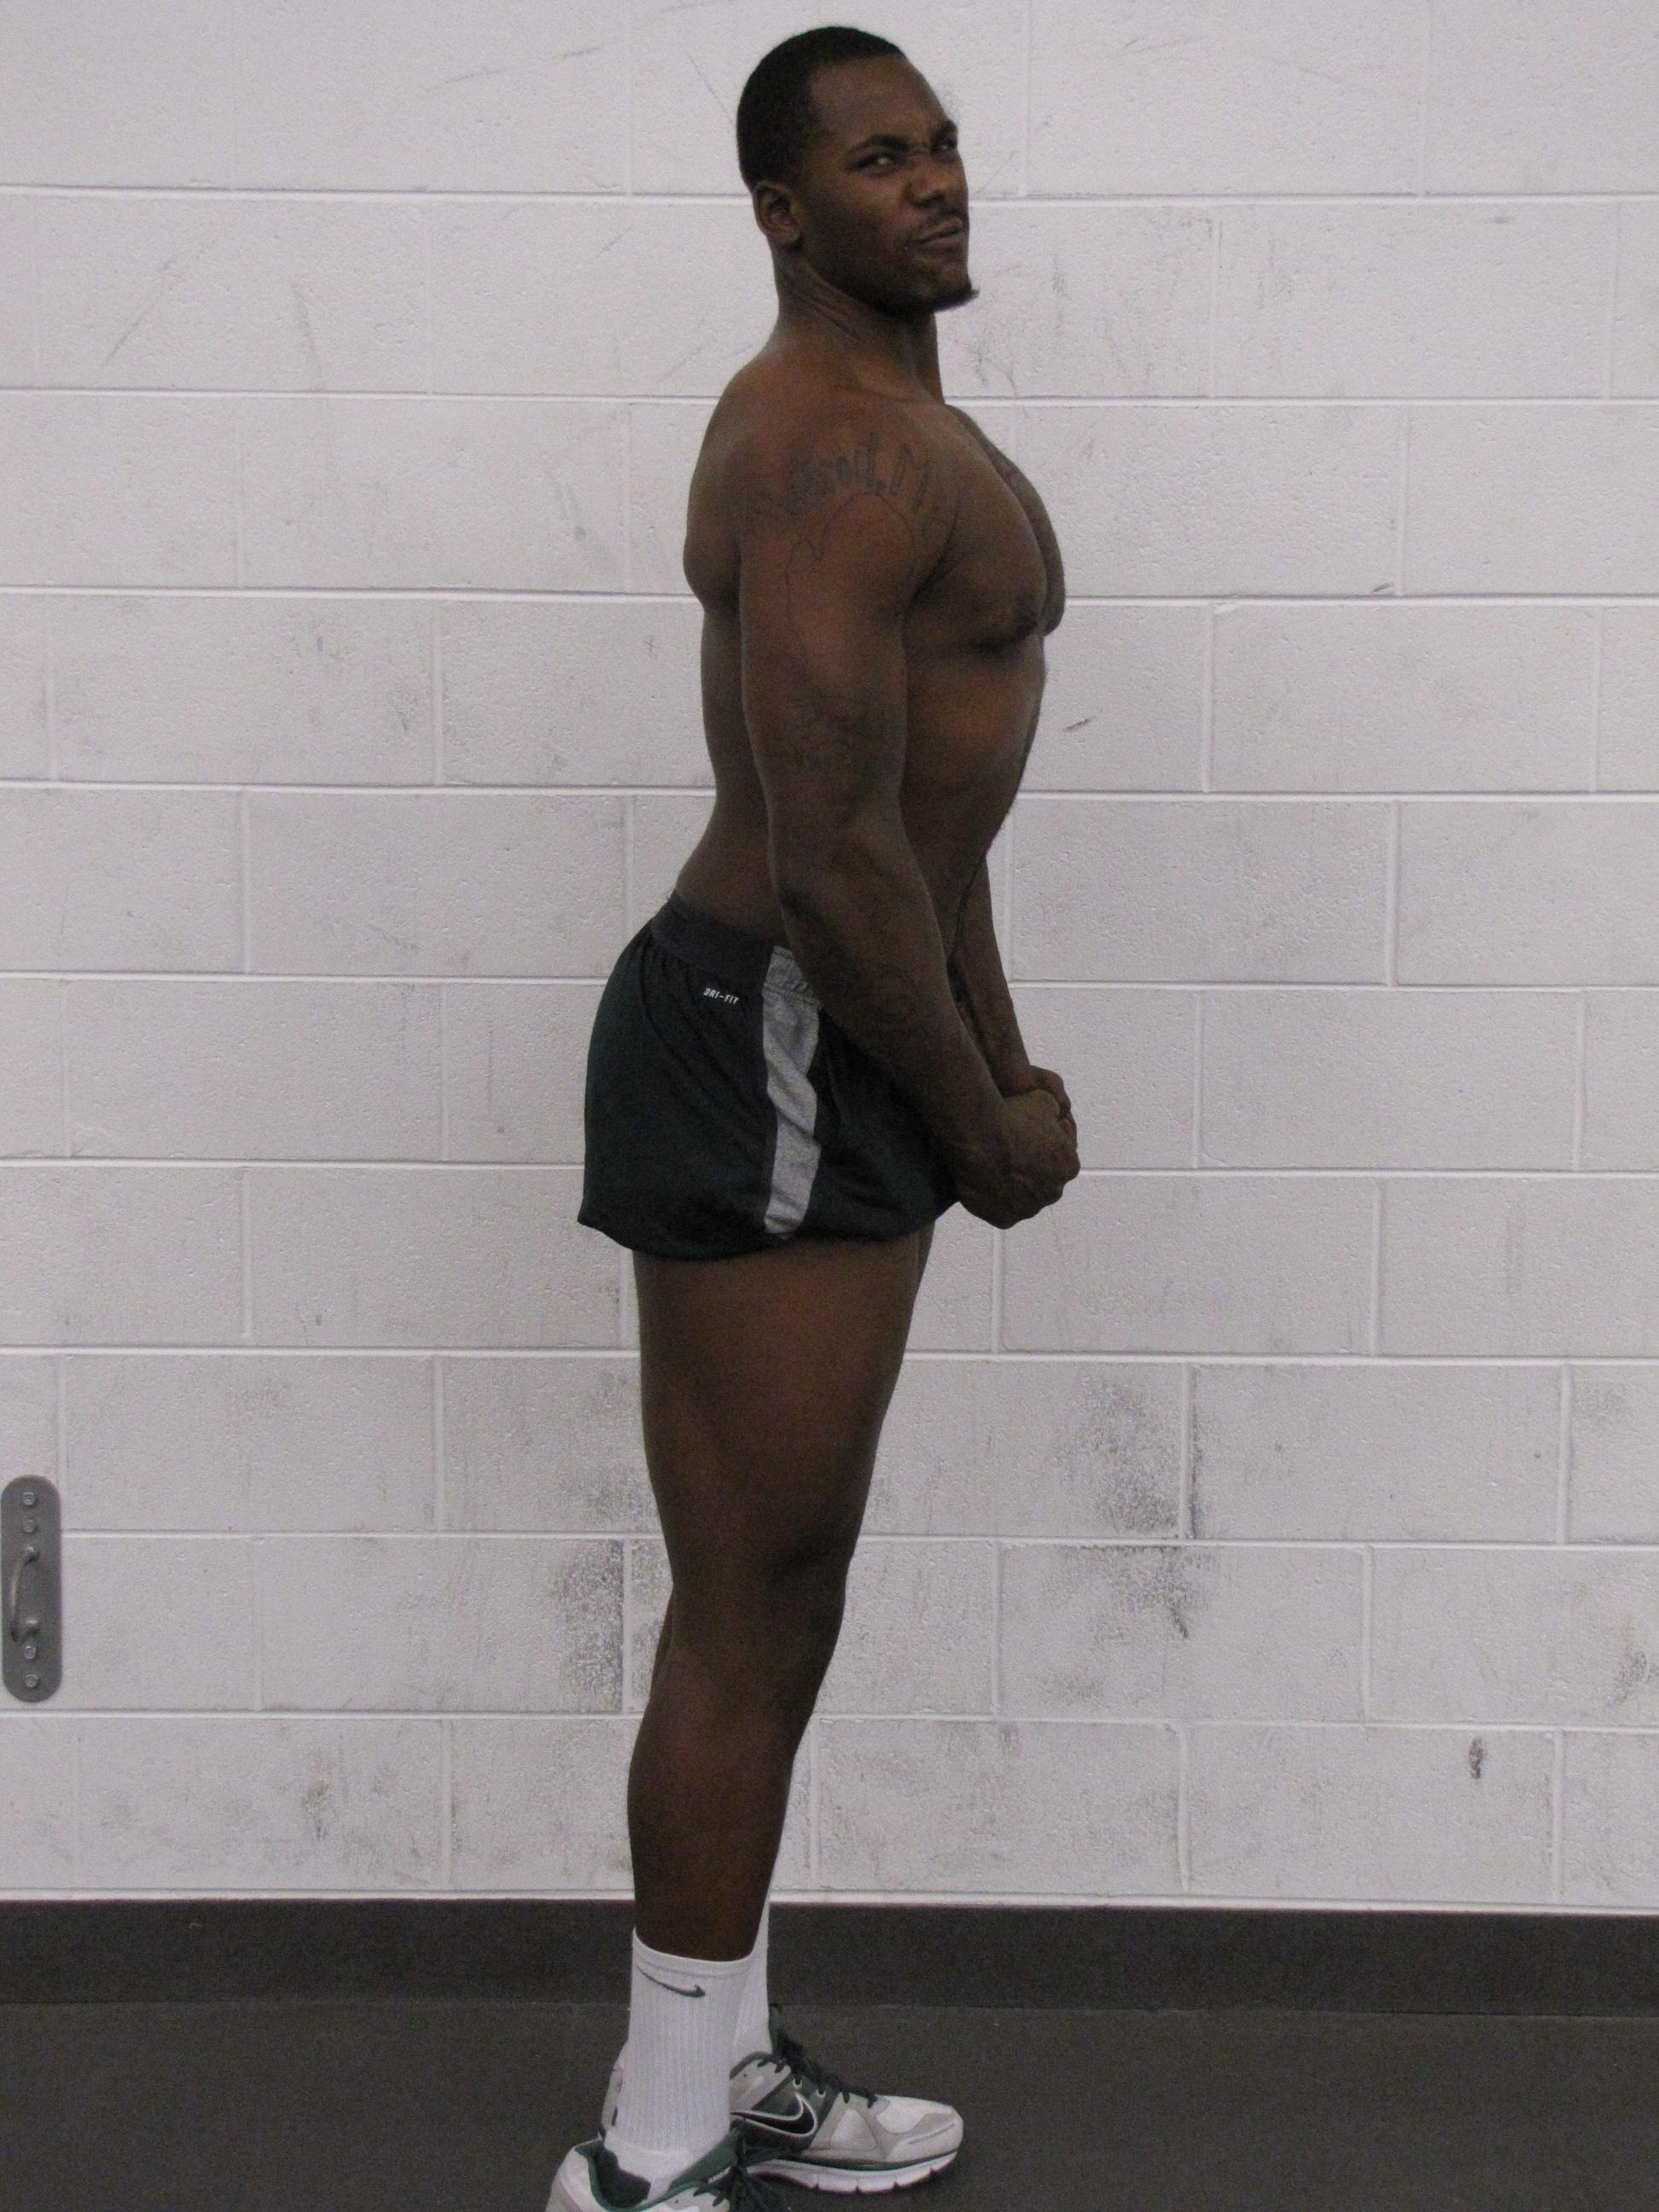 Michigan State's Nix changes his lifestyle - CBSSports.com